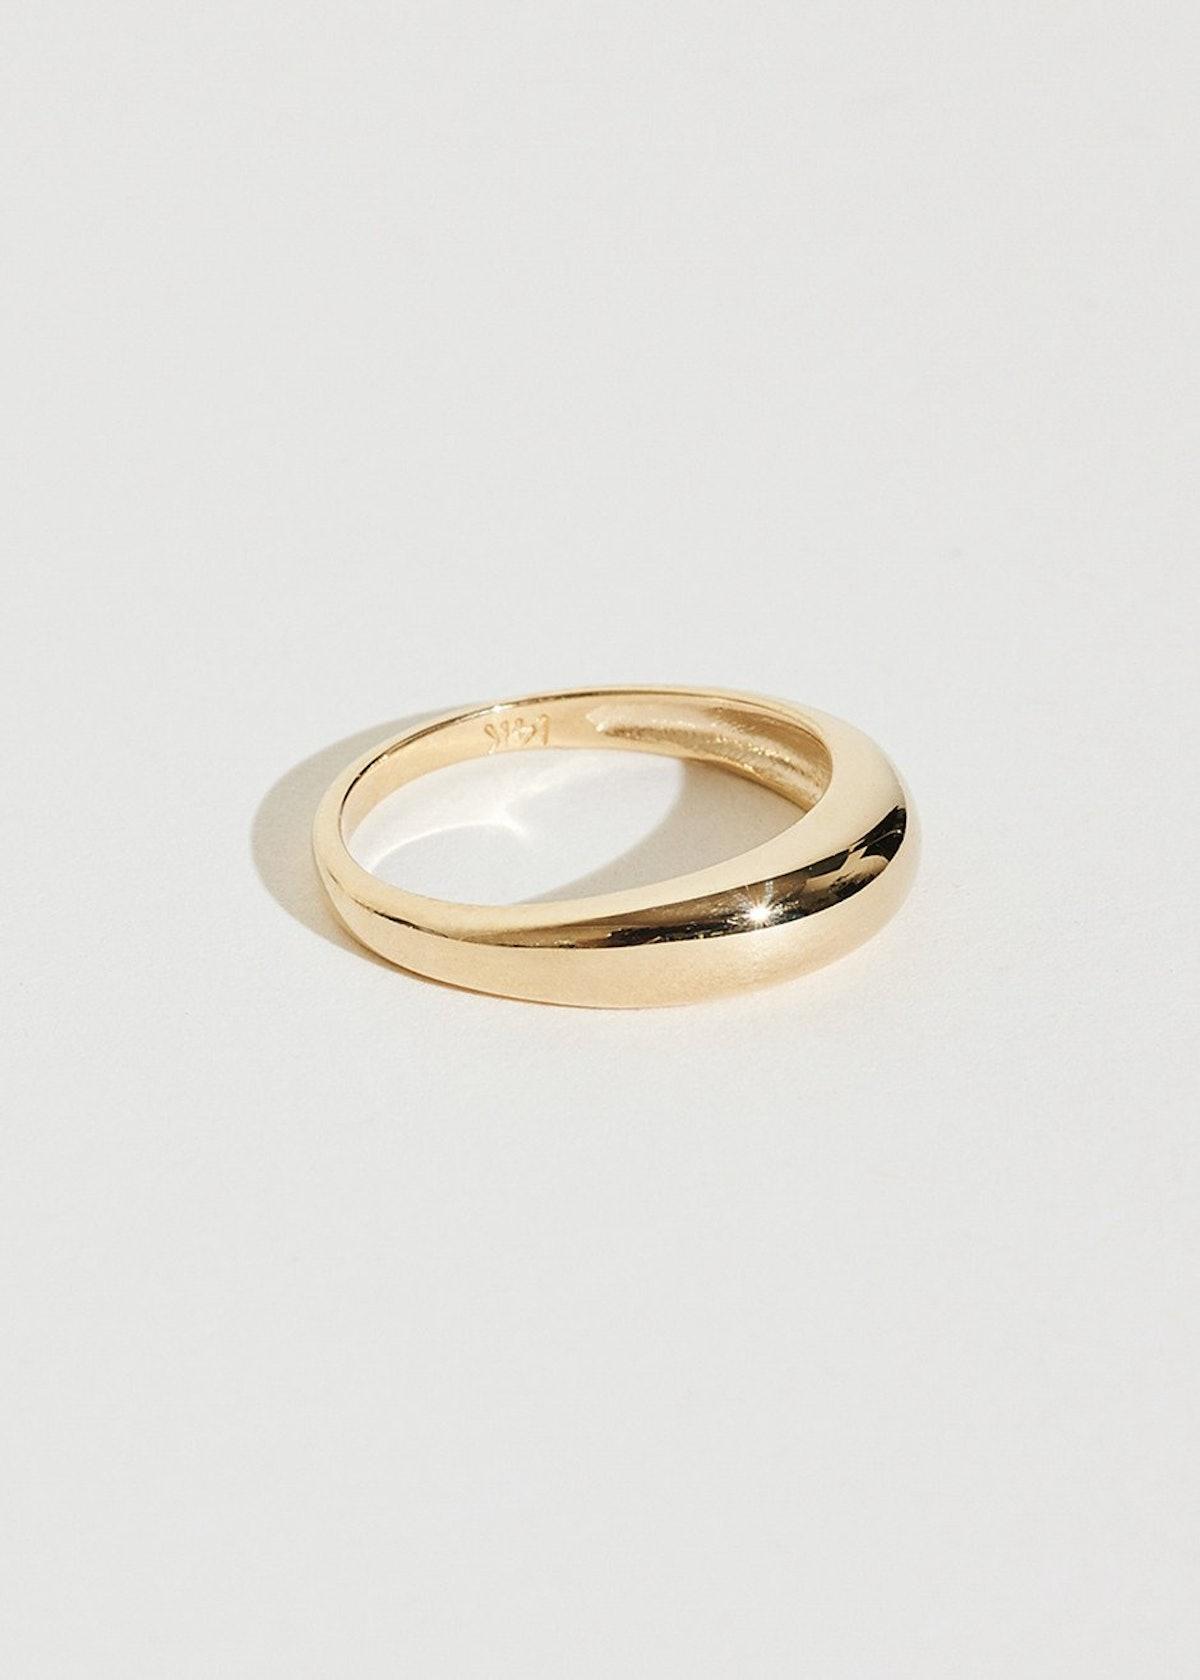 J. Hannah Gold Form Pinky Ring I